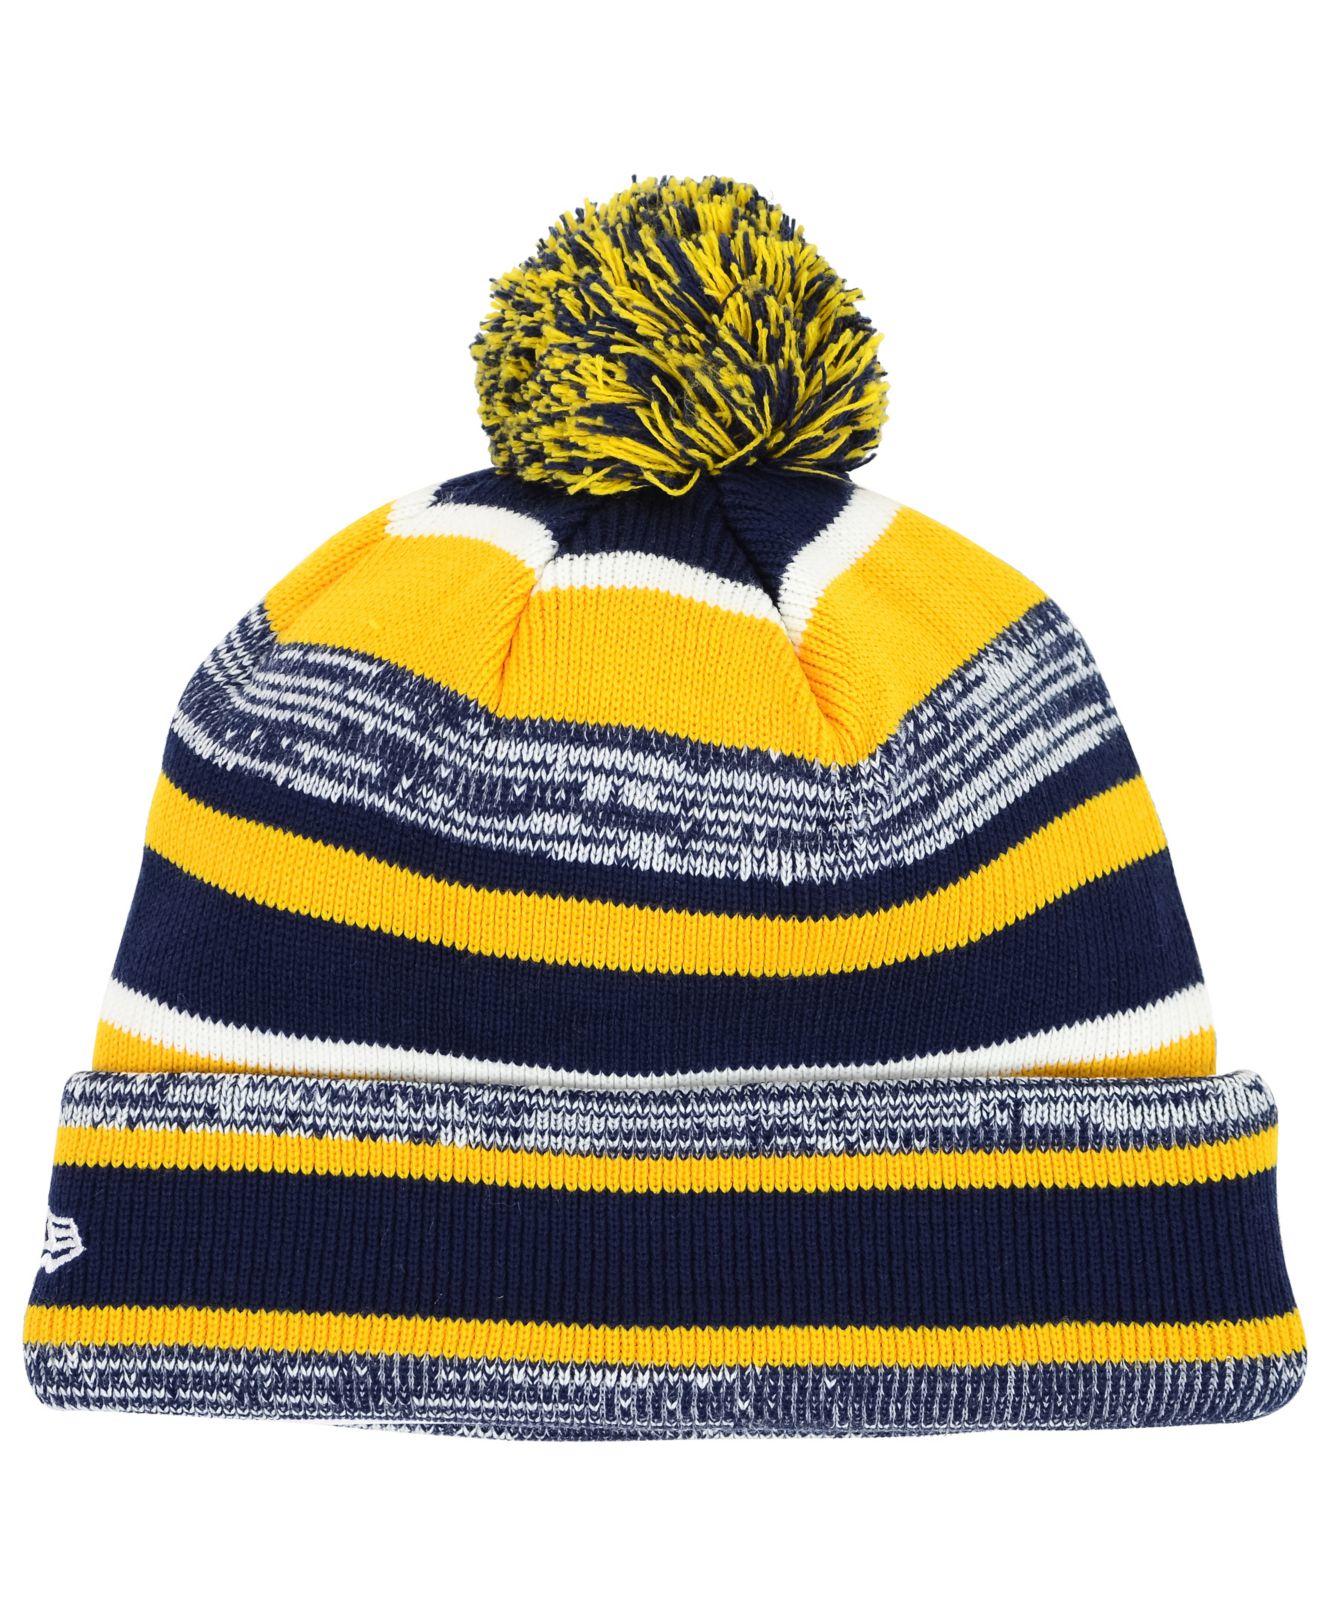 Lyst - KTZ Navy Midshipmen Sport Knit Hat for Men 5f136df02